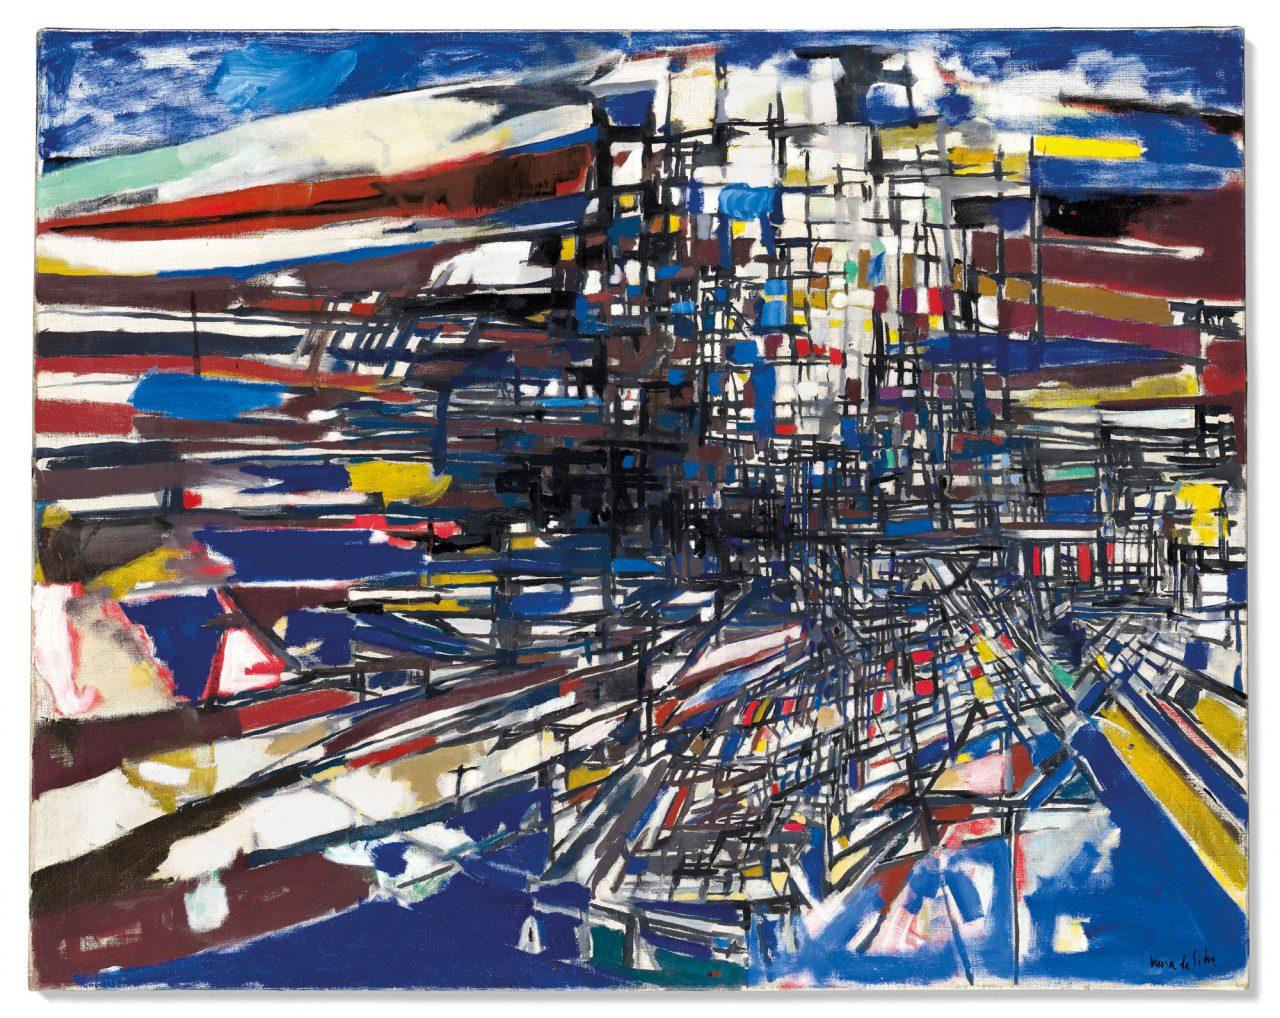 https://www.artsandcollections.com/wp-content/uploads/2020/06/maria_helena_vieira_da_silva_tours_darme-1280x1018.jpg